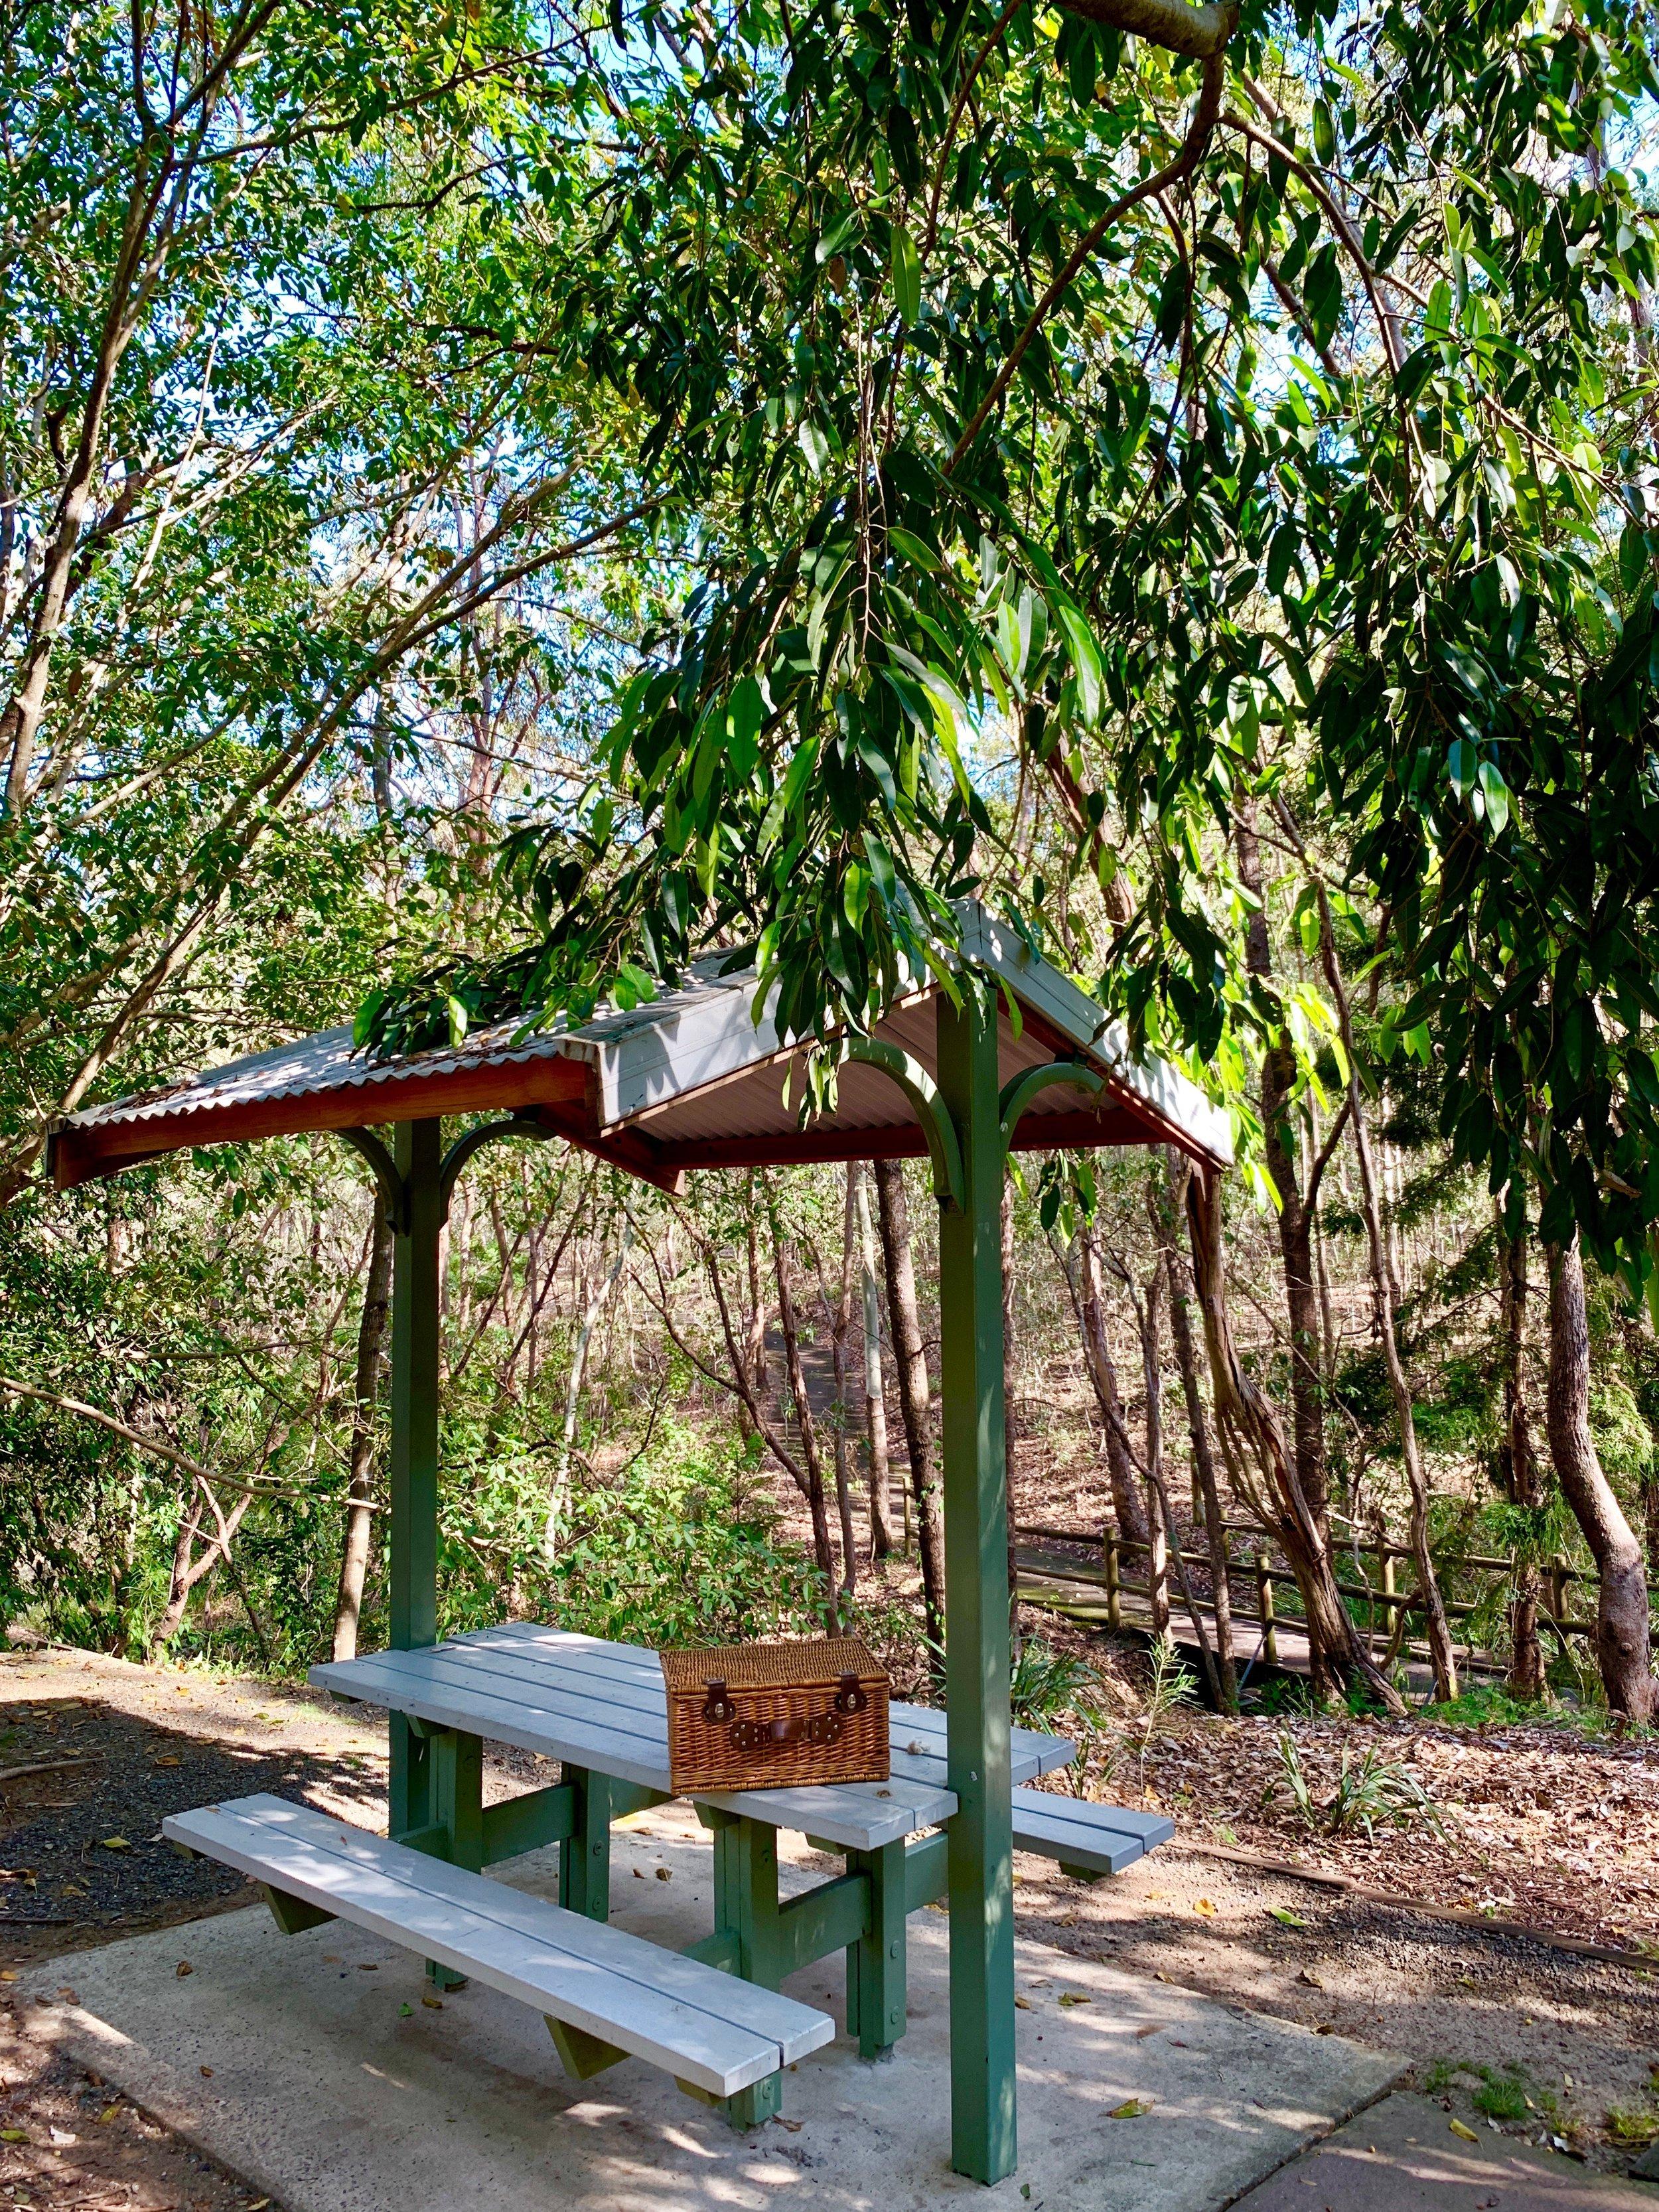 Lady Brisbane Denmark Hill conservation park